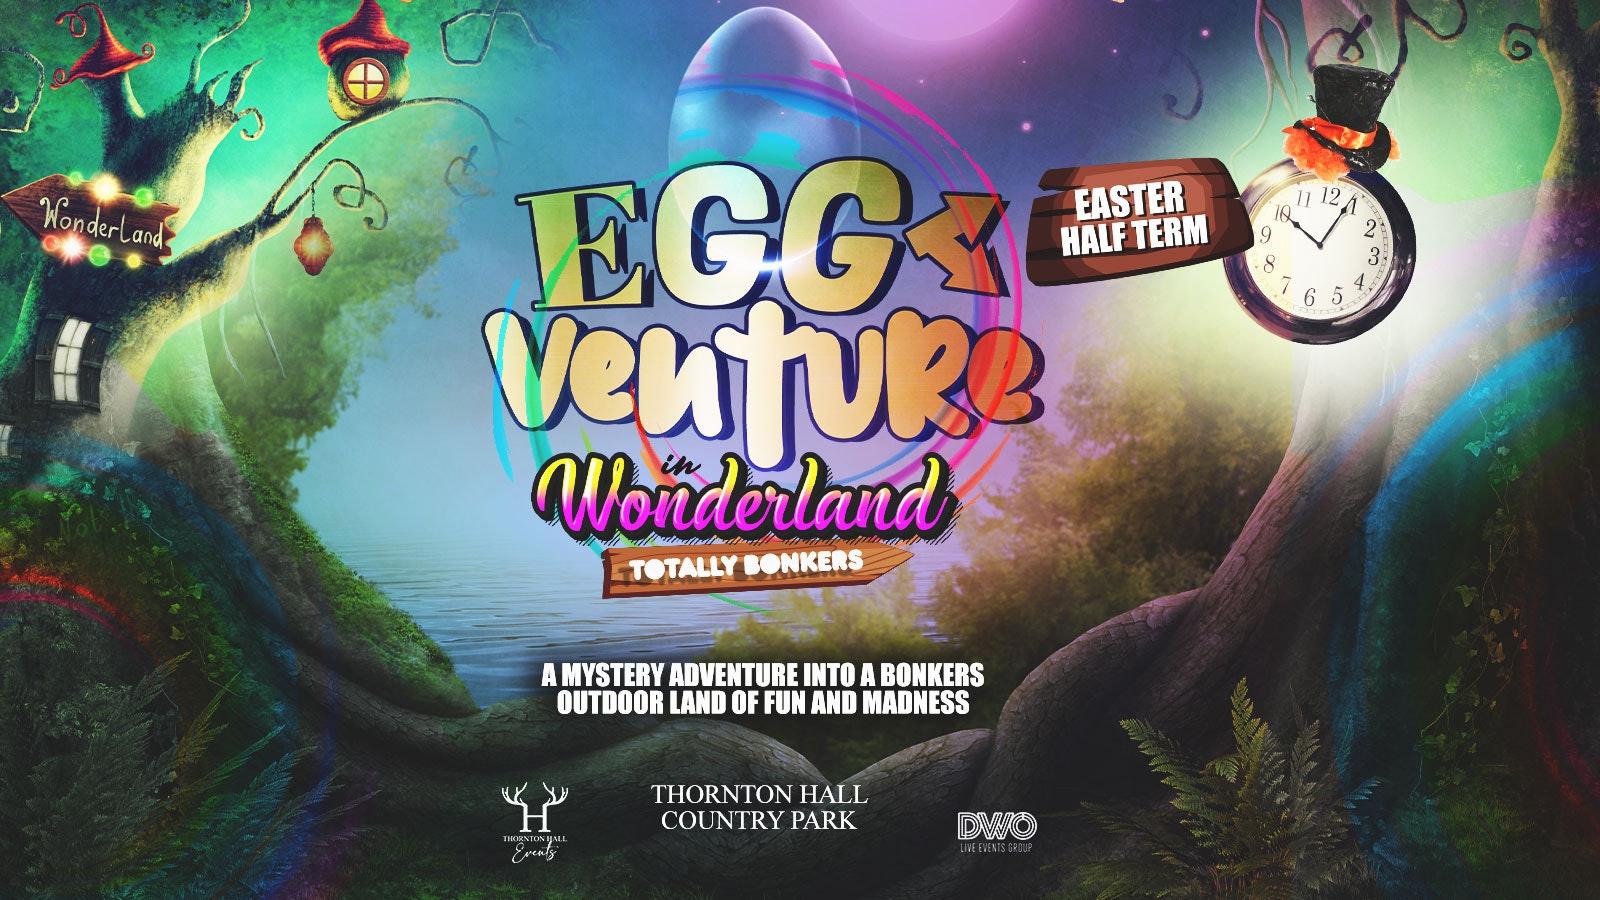 EggVenture in Wonderland -Saturday 10th April – 12.30pm